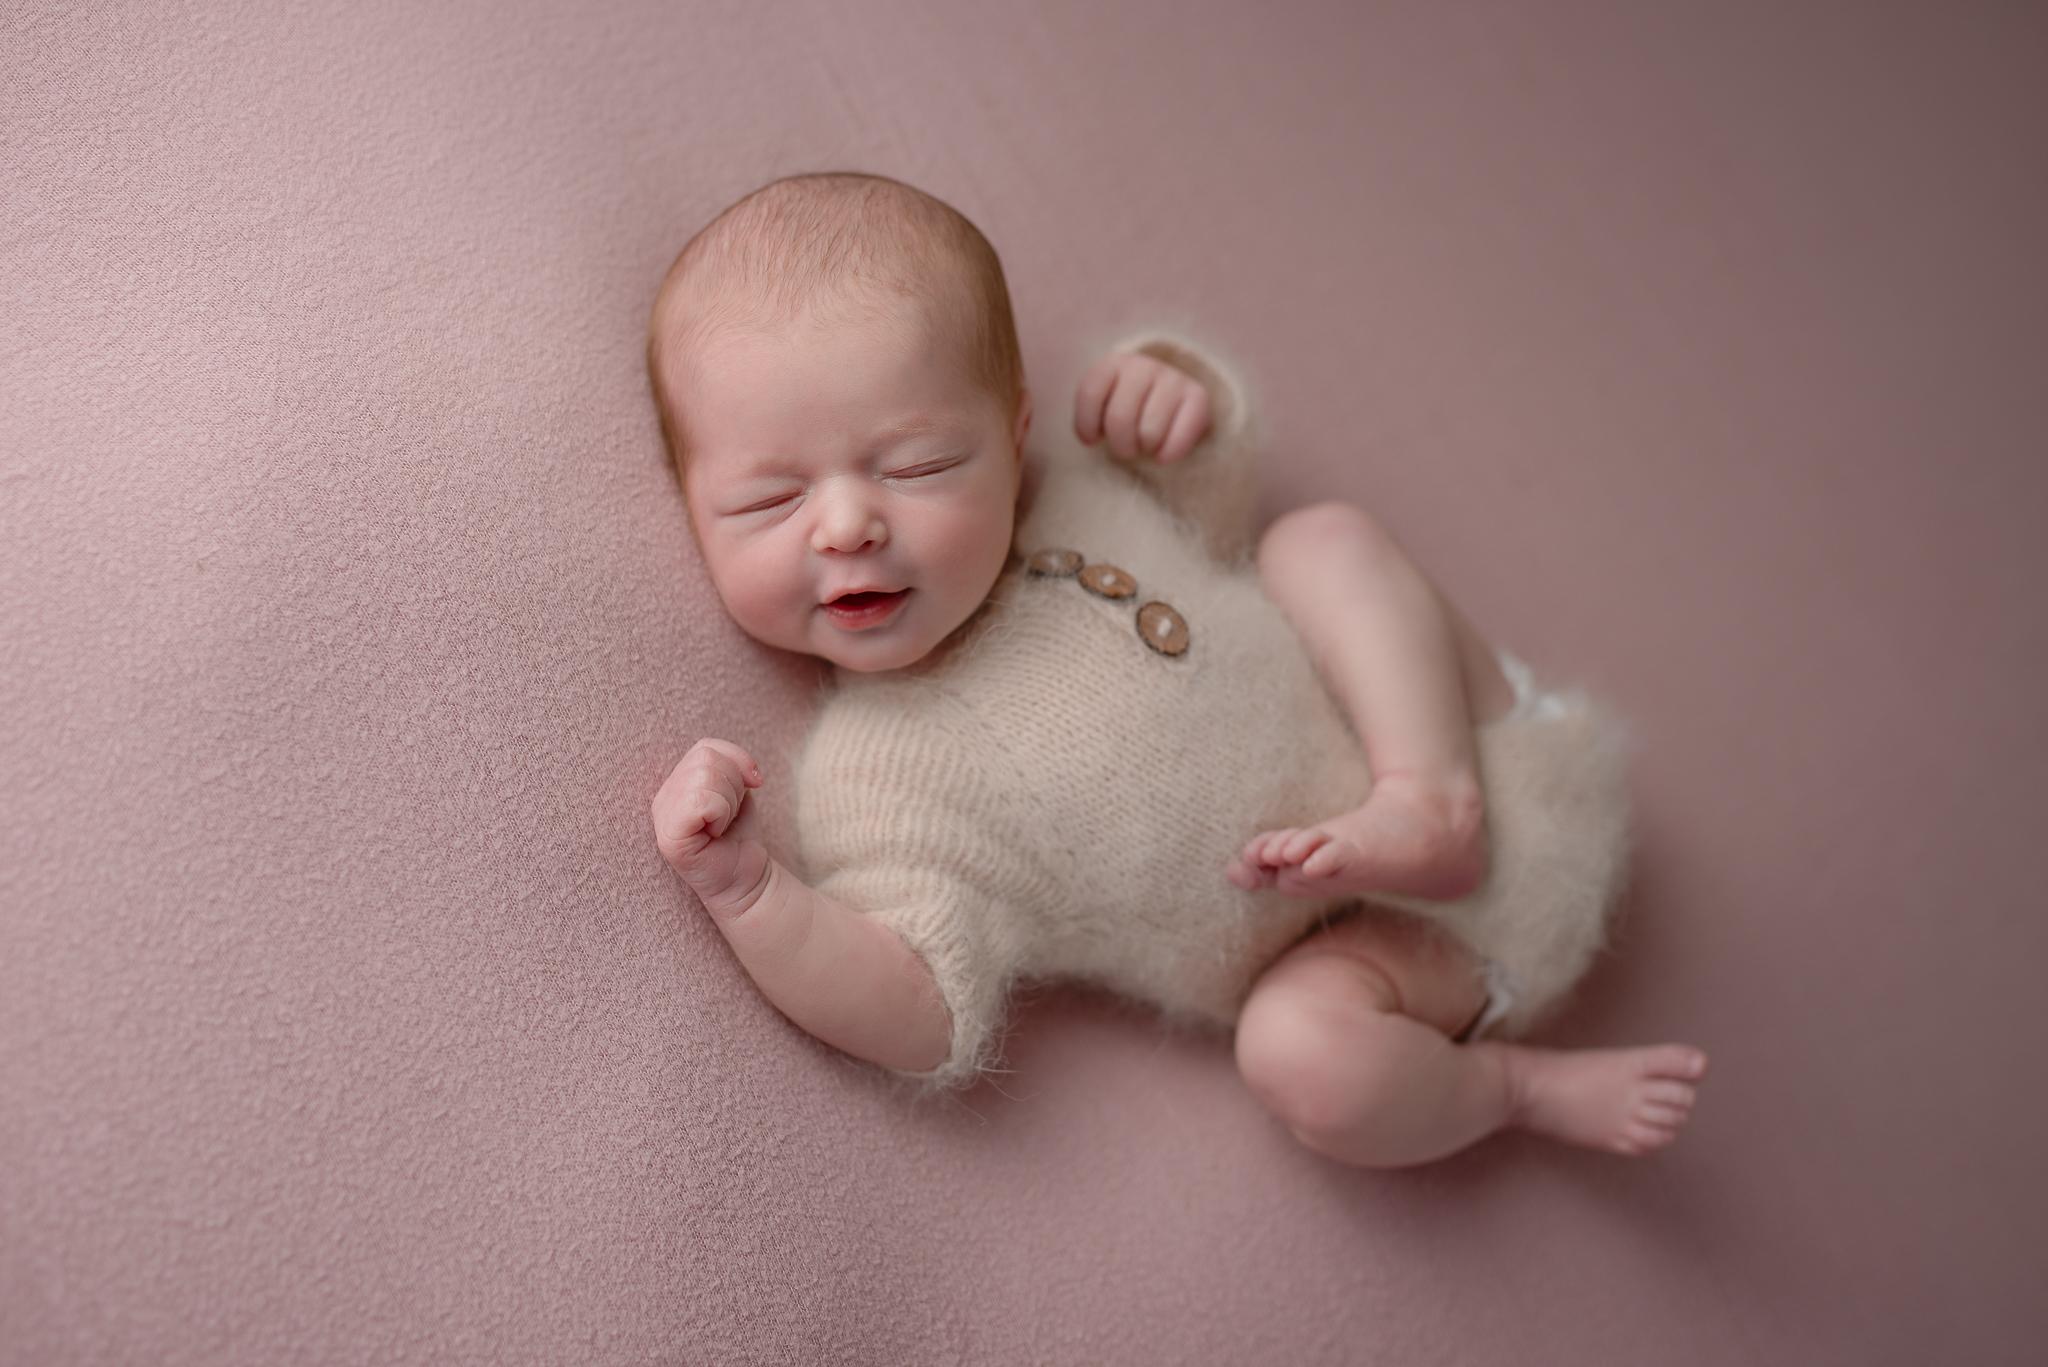 Newborn515NaomiLuciennePhotography032019-Edit.jpg